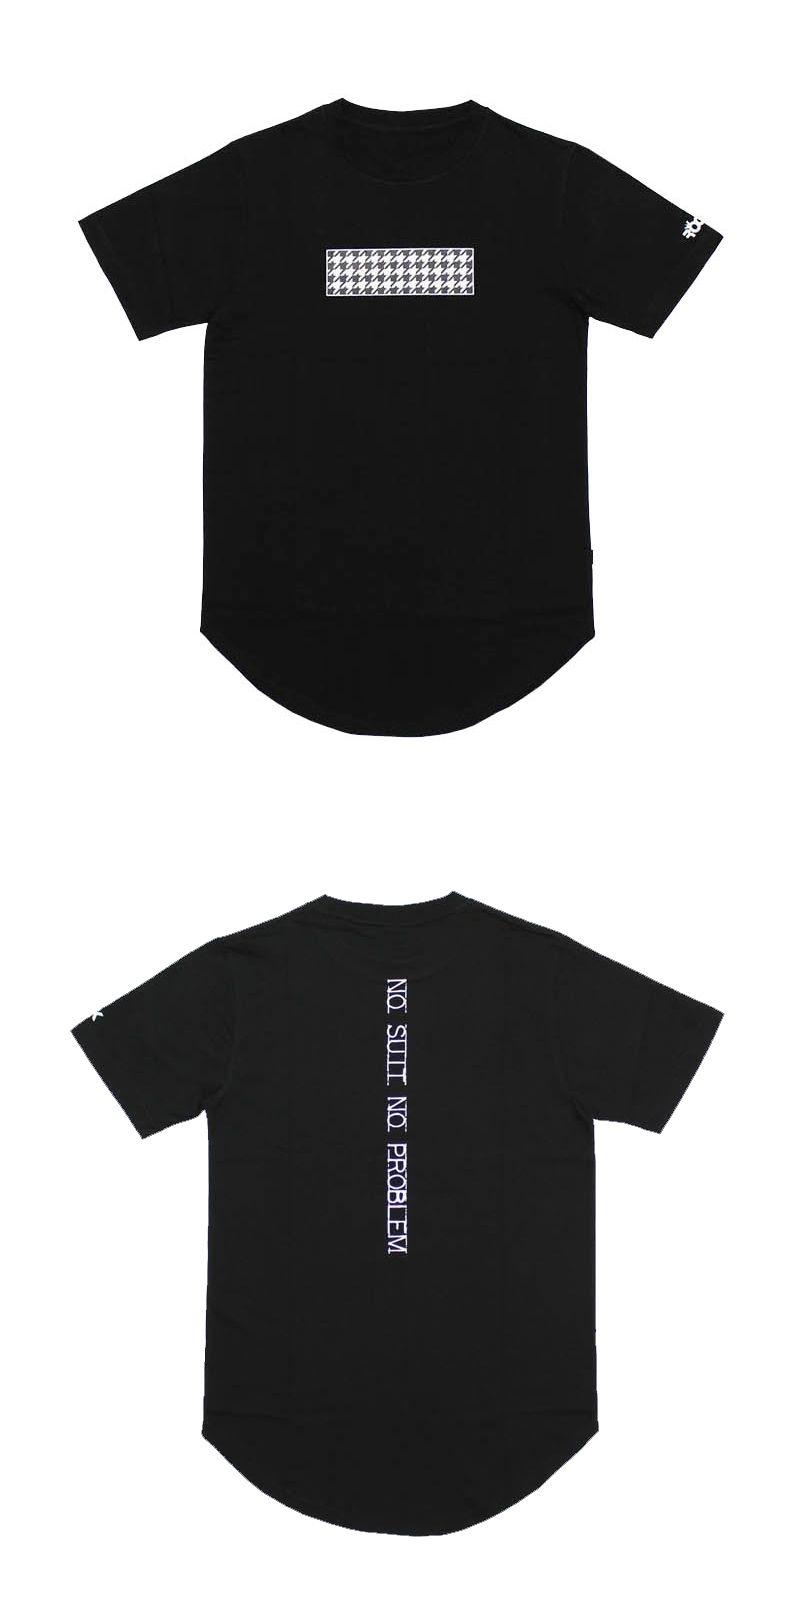 2016 extend hip hop street T-shirt wholesale fashion brand black t ...